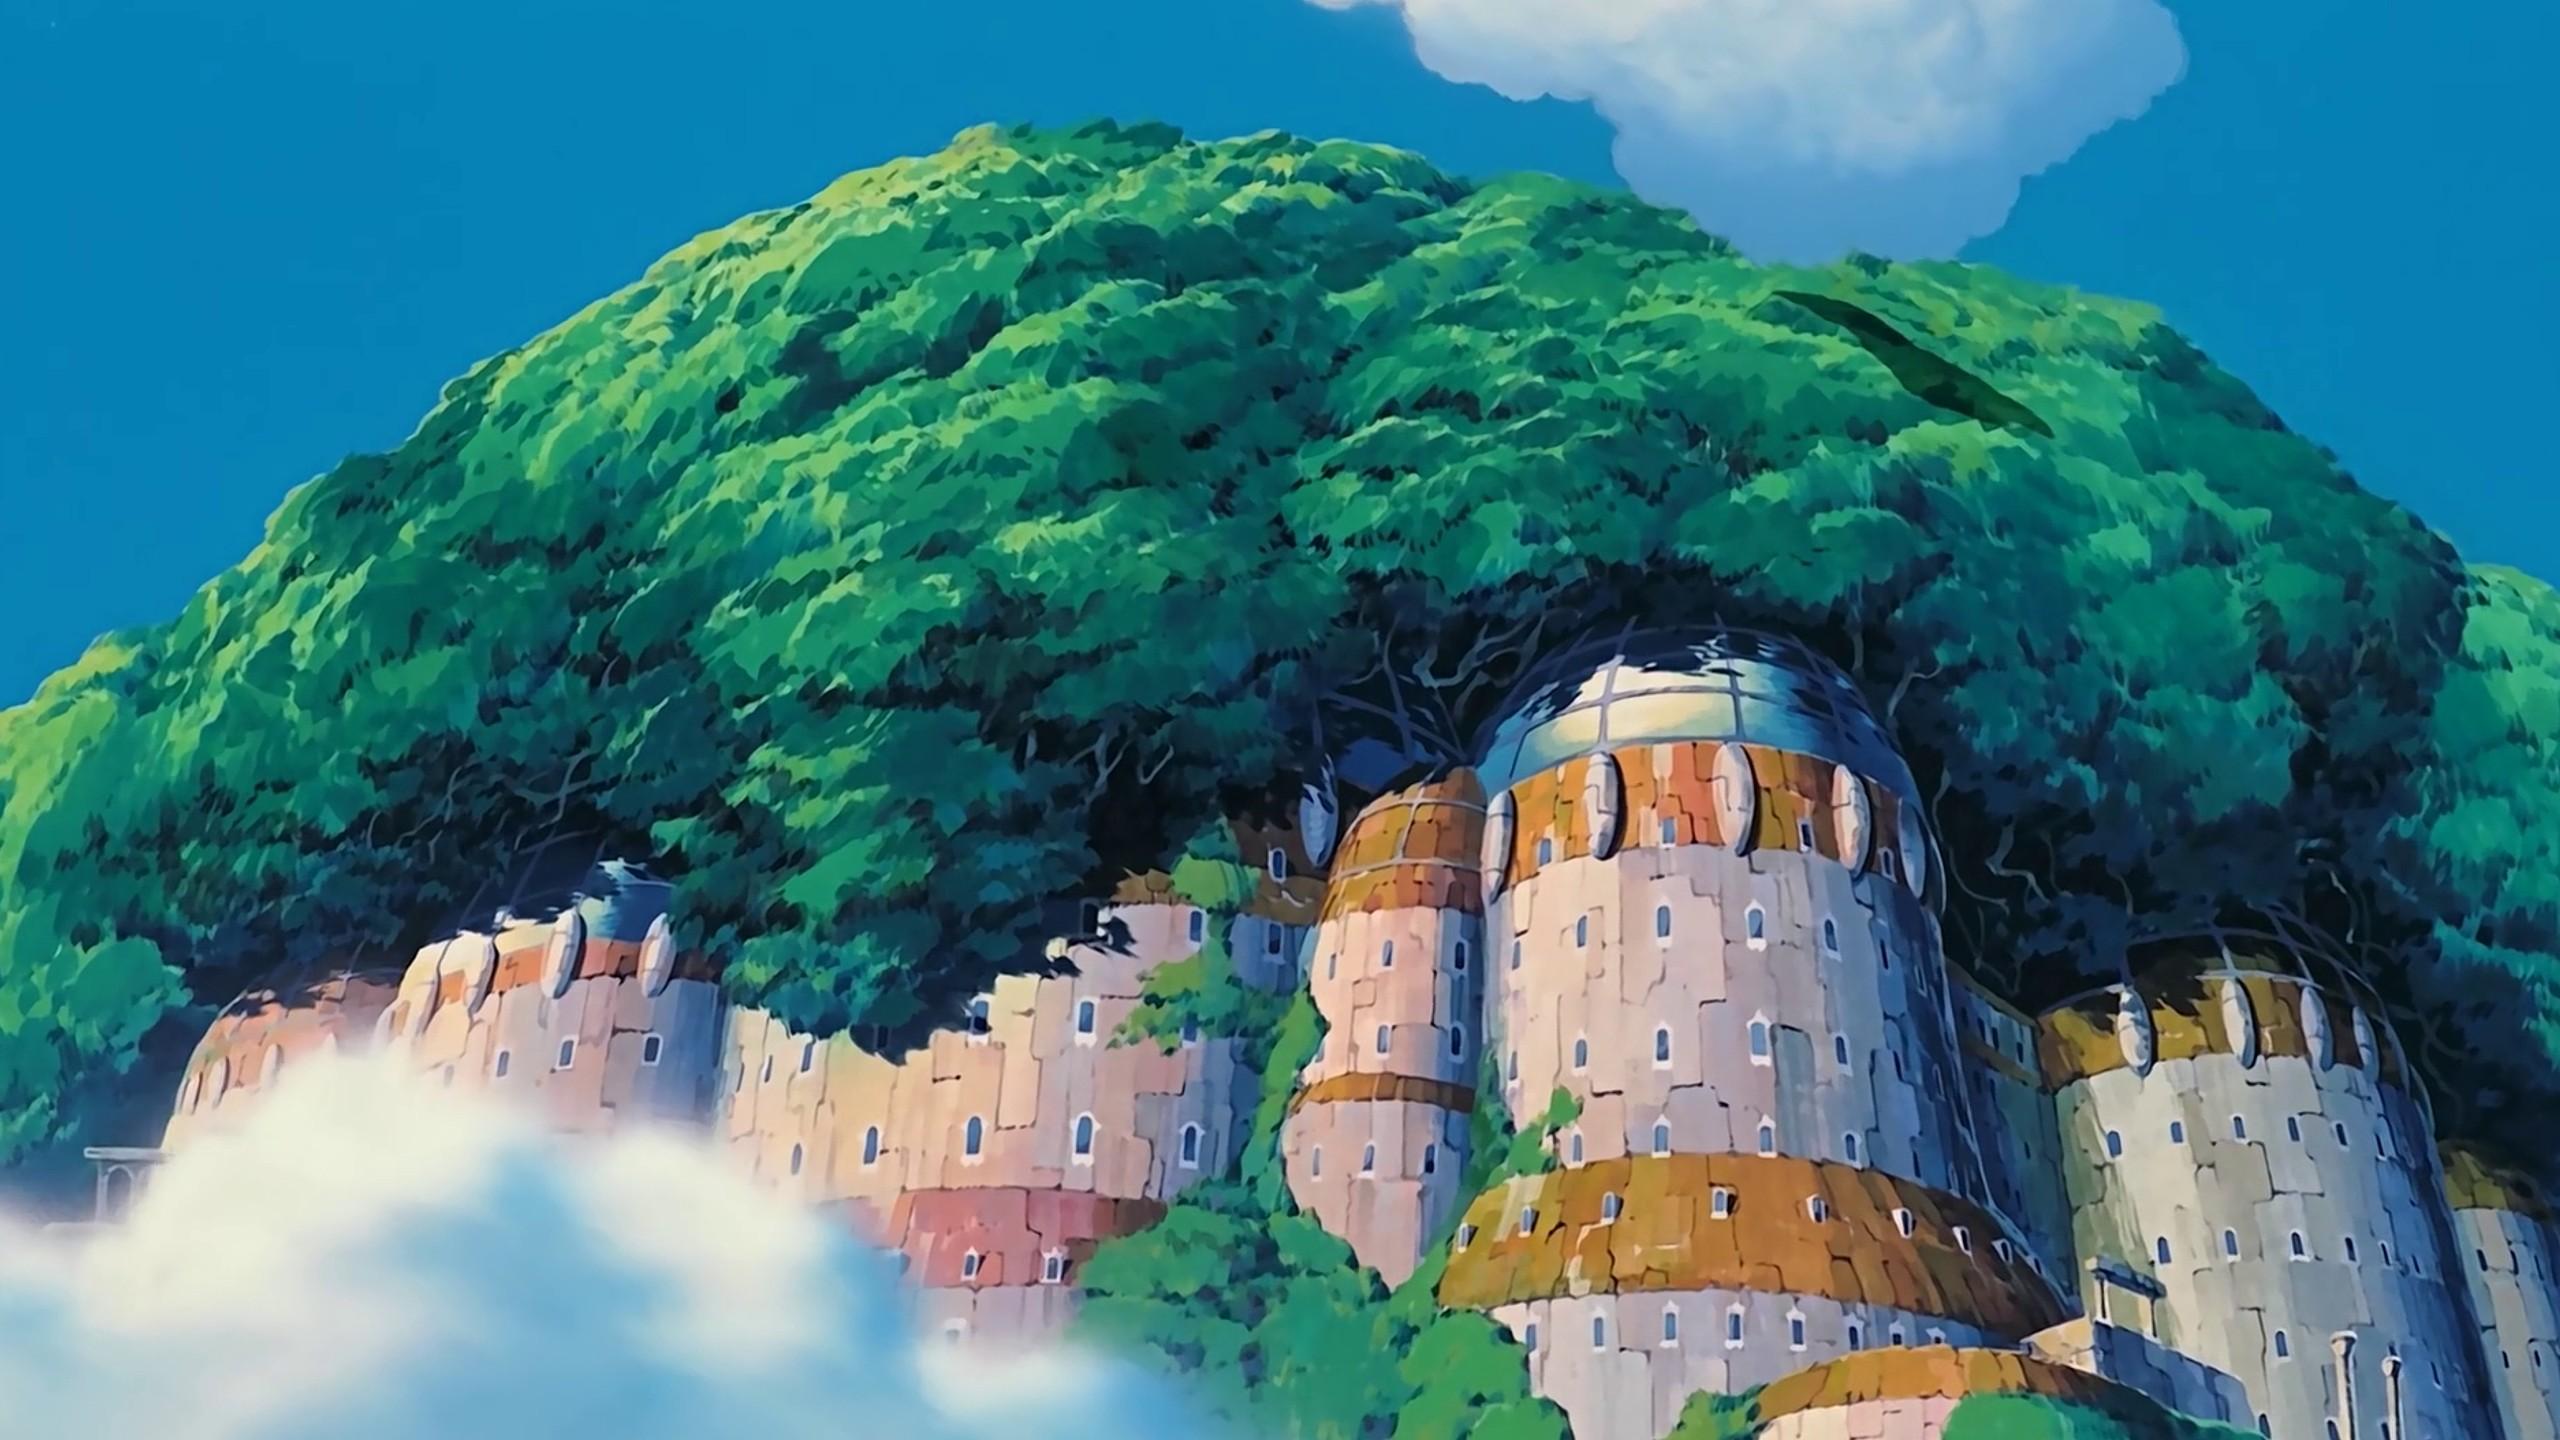 Studio Ghibli Wallpaper ·① Download Free Stunning HD